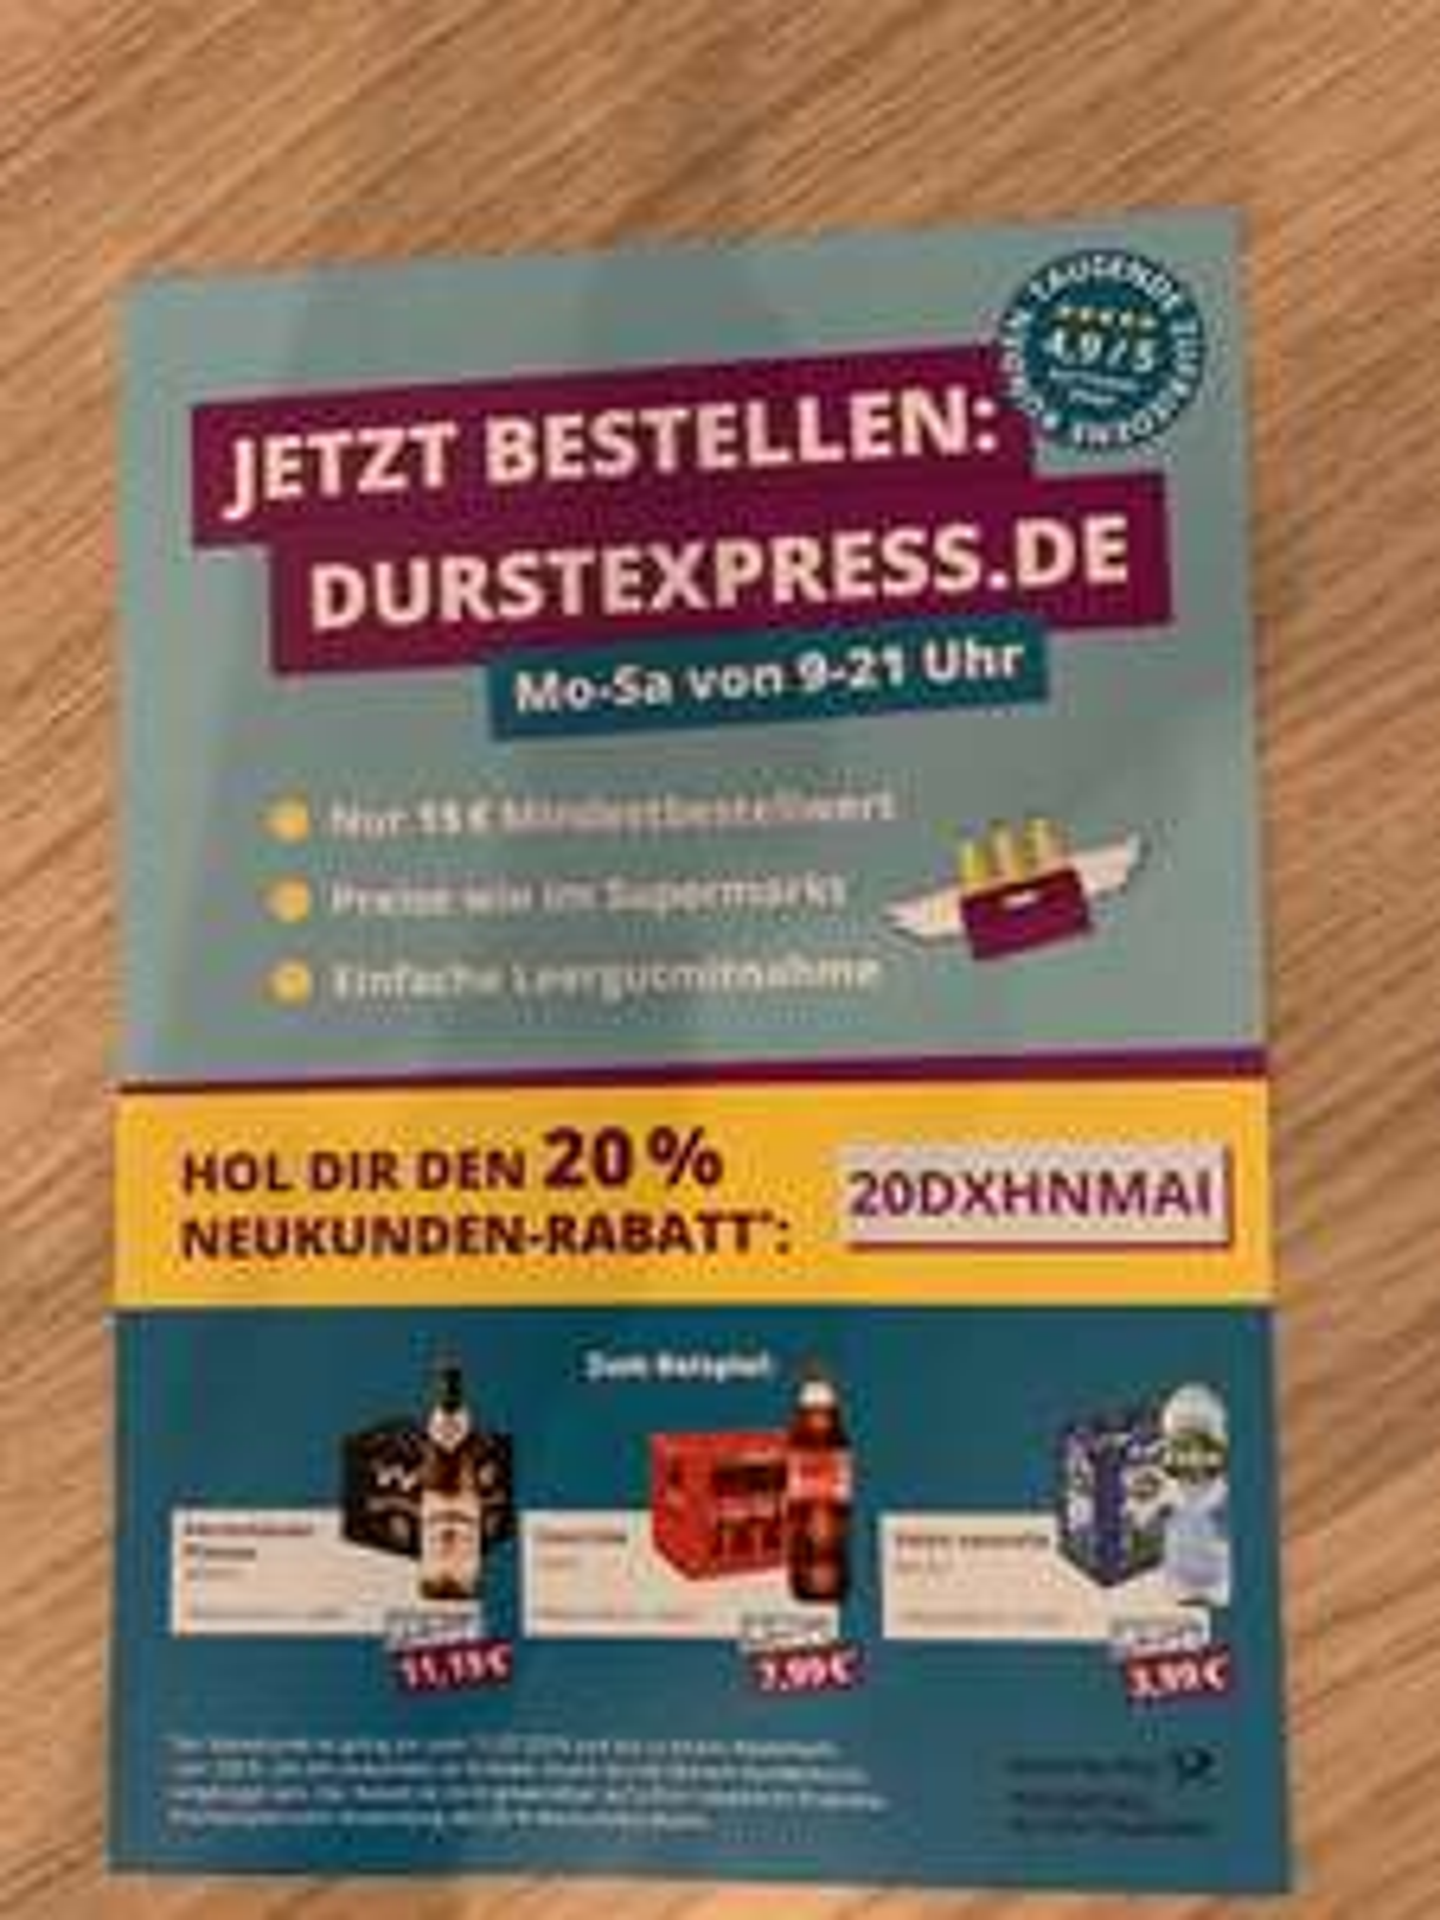 20% Neukundenrabatt bei Durstexpress - Hannover [Lokal]